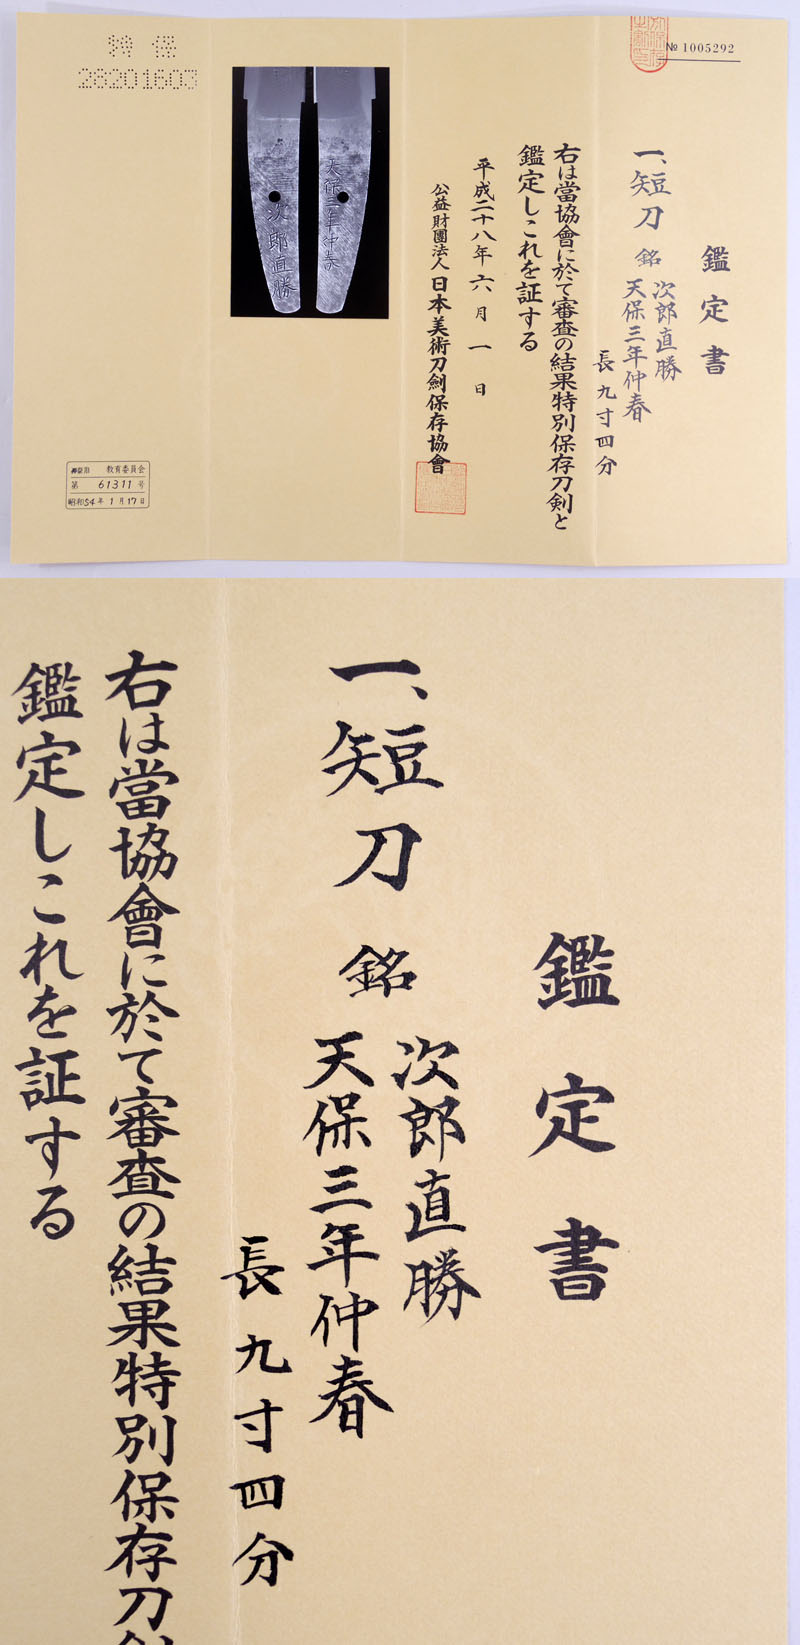 次郎直勝 (次郎太郎直勝) Picture of Certificate